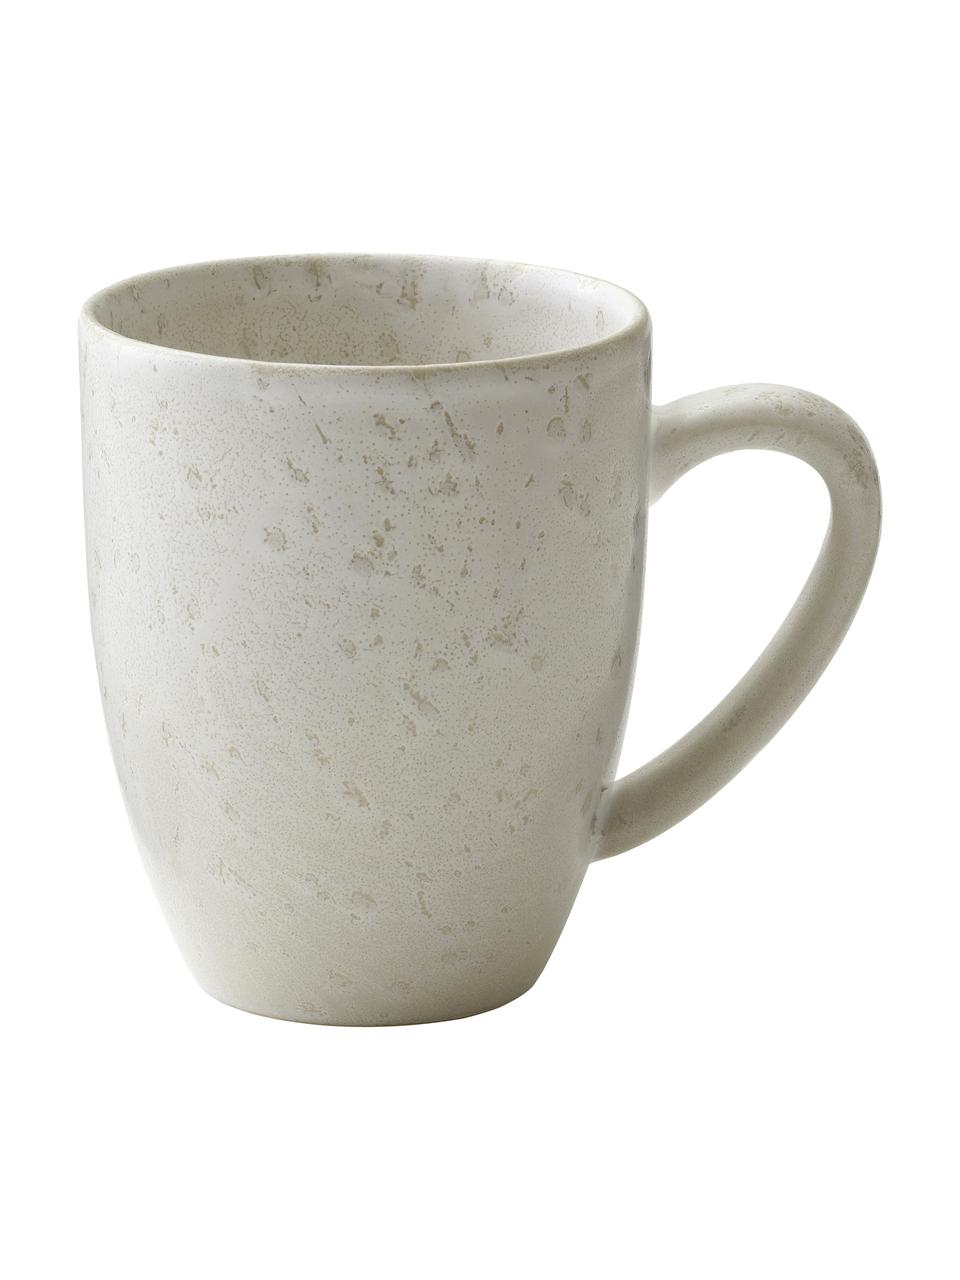 Tazza in gres beige chiaro maculato Bizz, Gres, Beige chiaro, Ø 9 x Alt. 10 cm